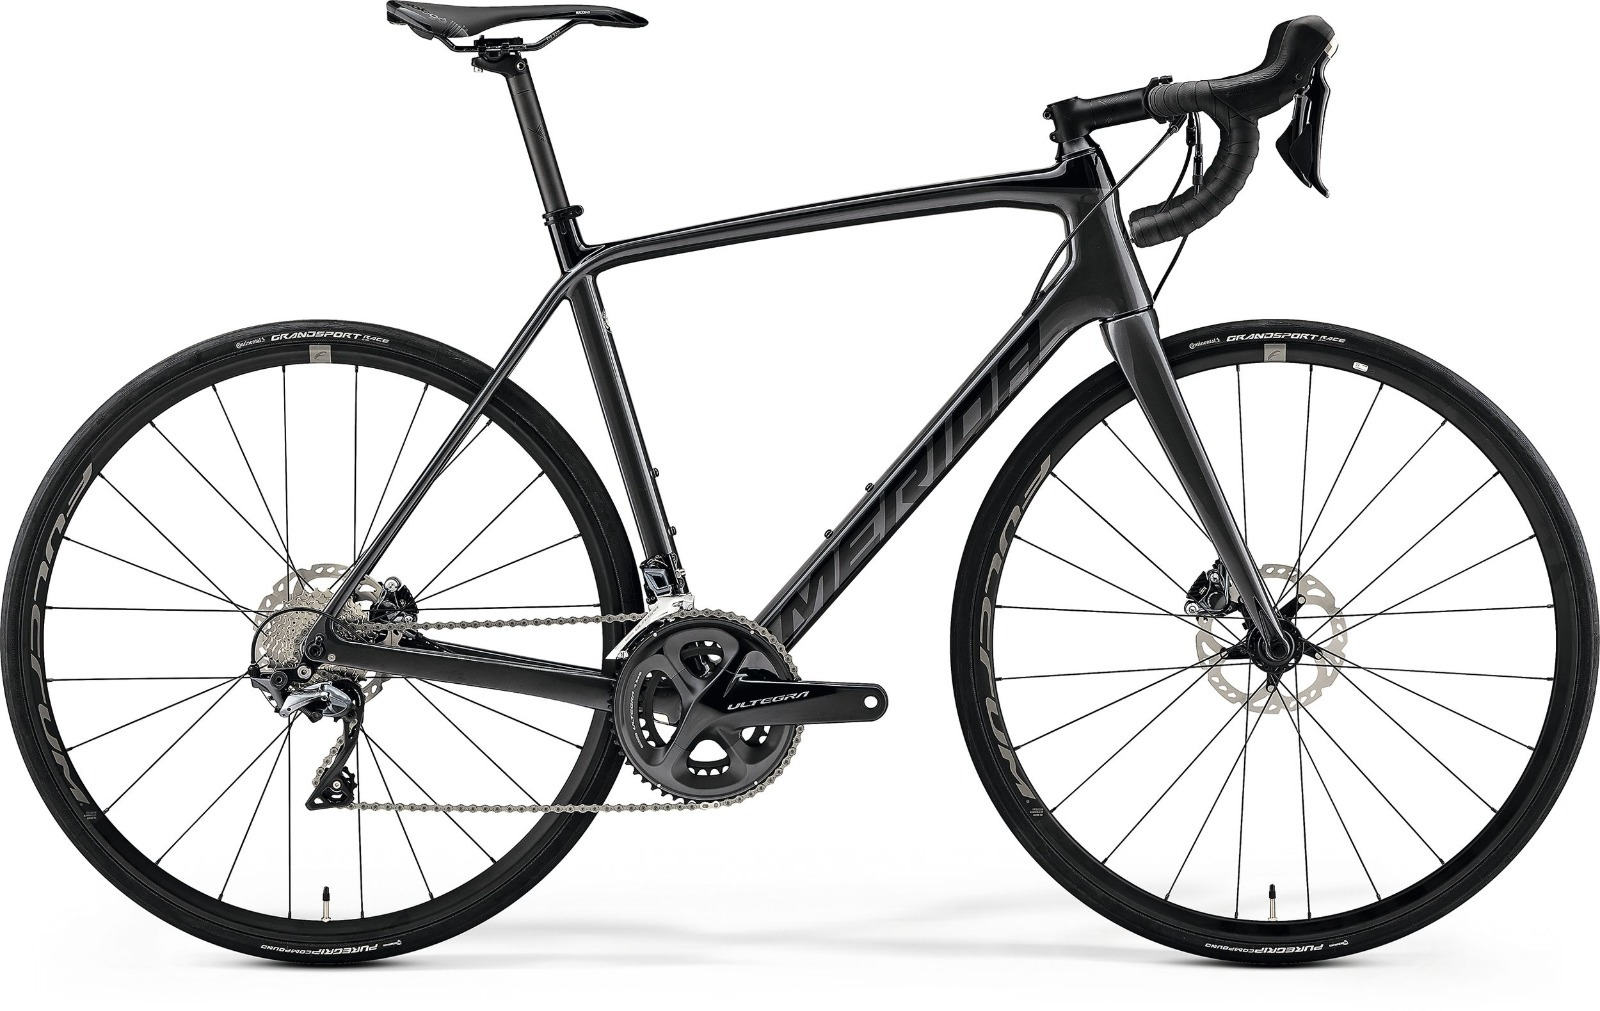 Bici da Corsa Scultura 6000 Disc Carbon - Noleggio Bici Canazei